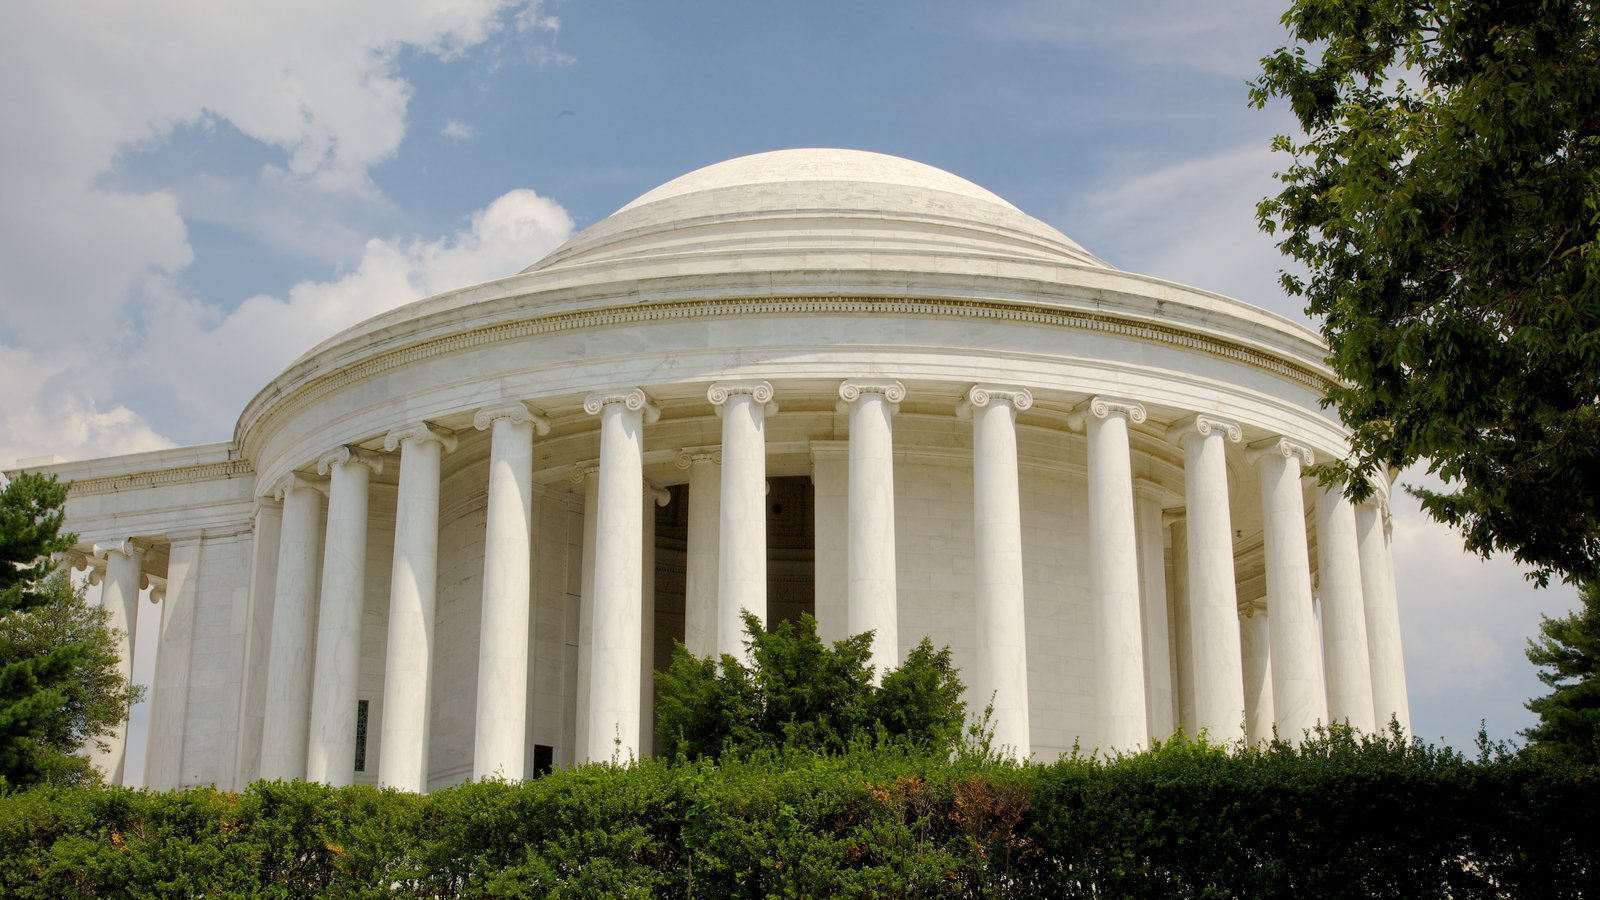 Jefferson Memorial caracterizando um memorial